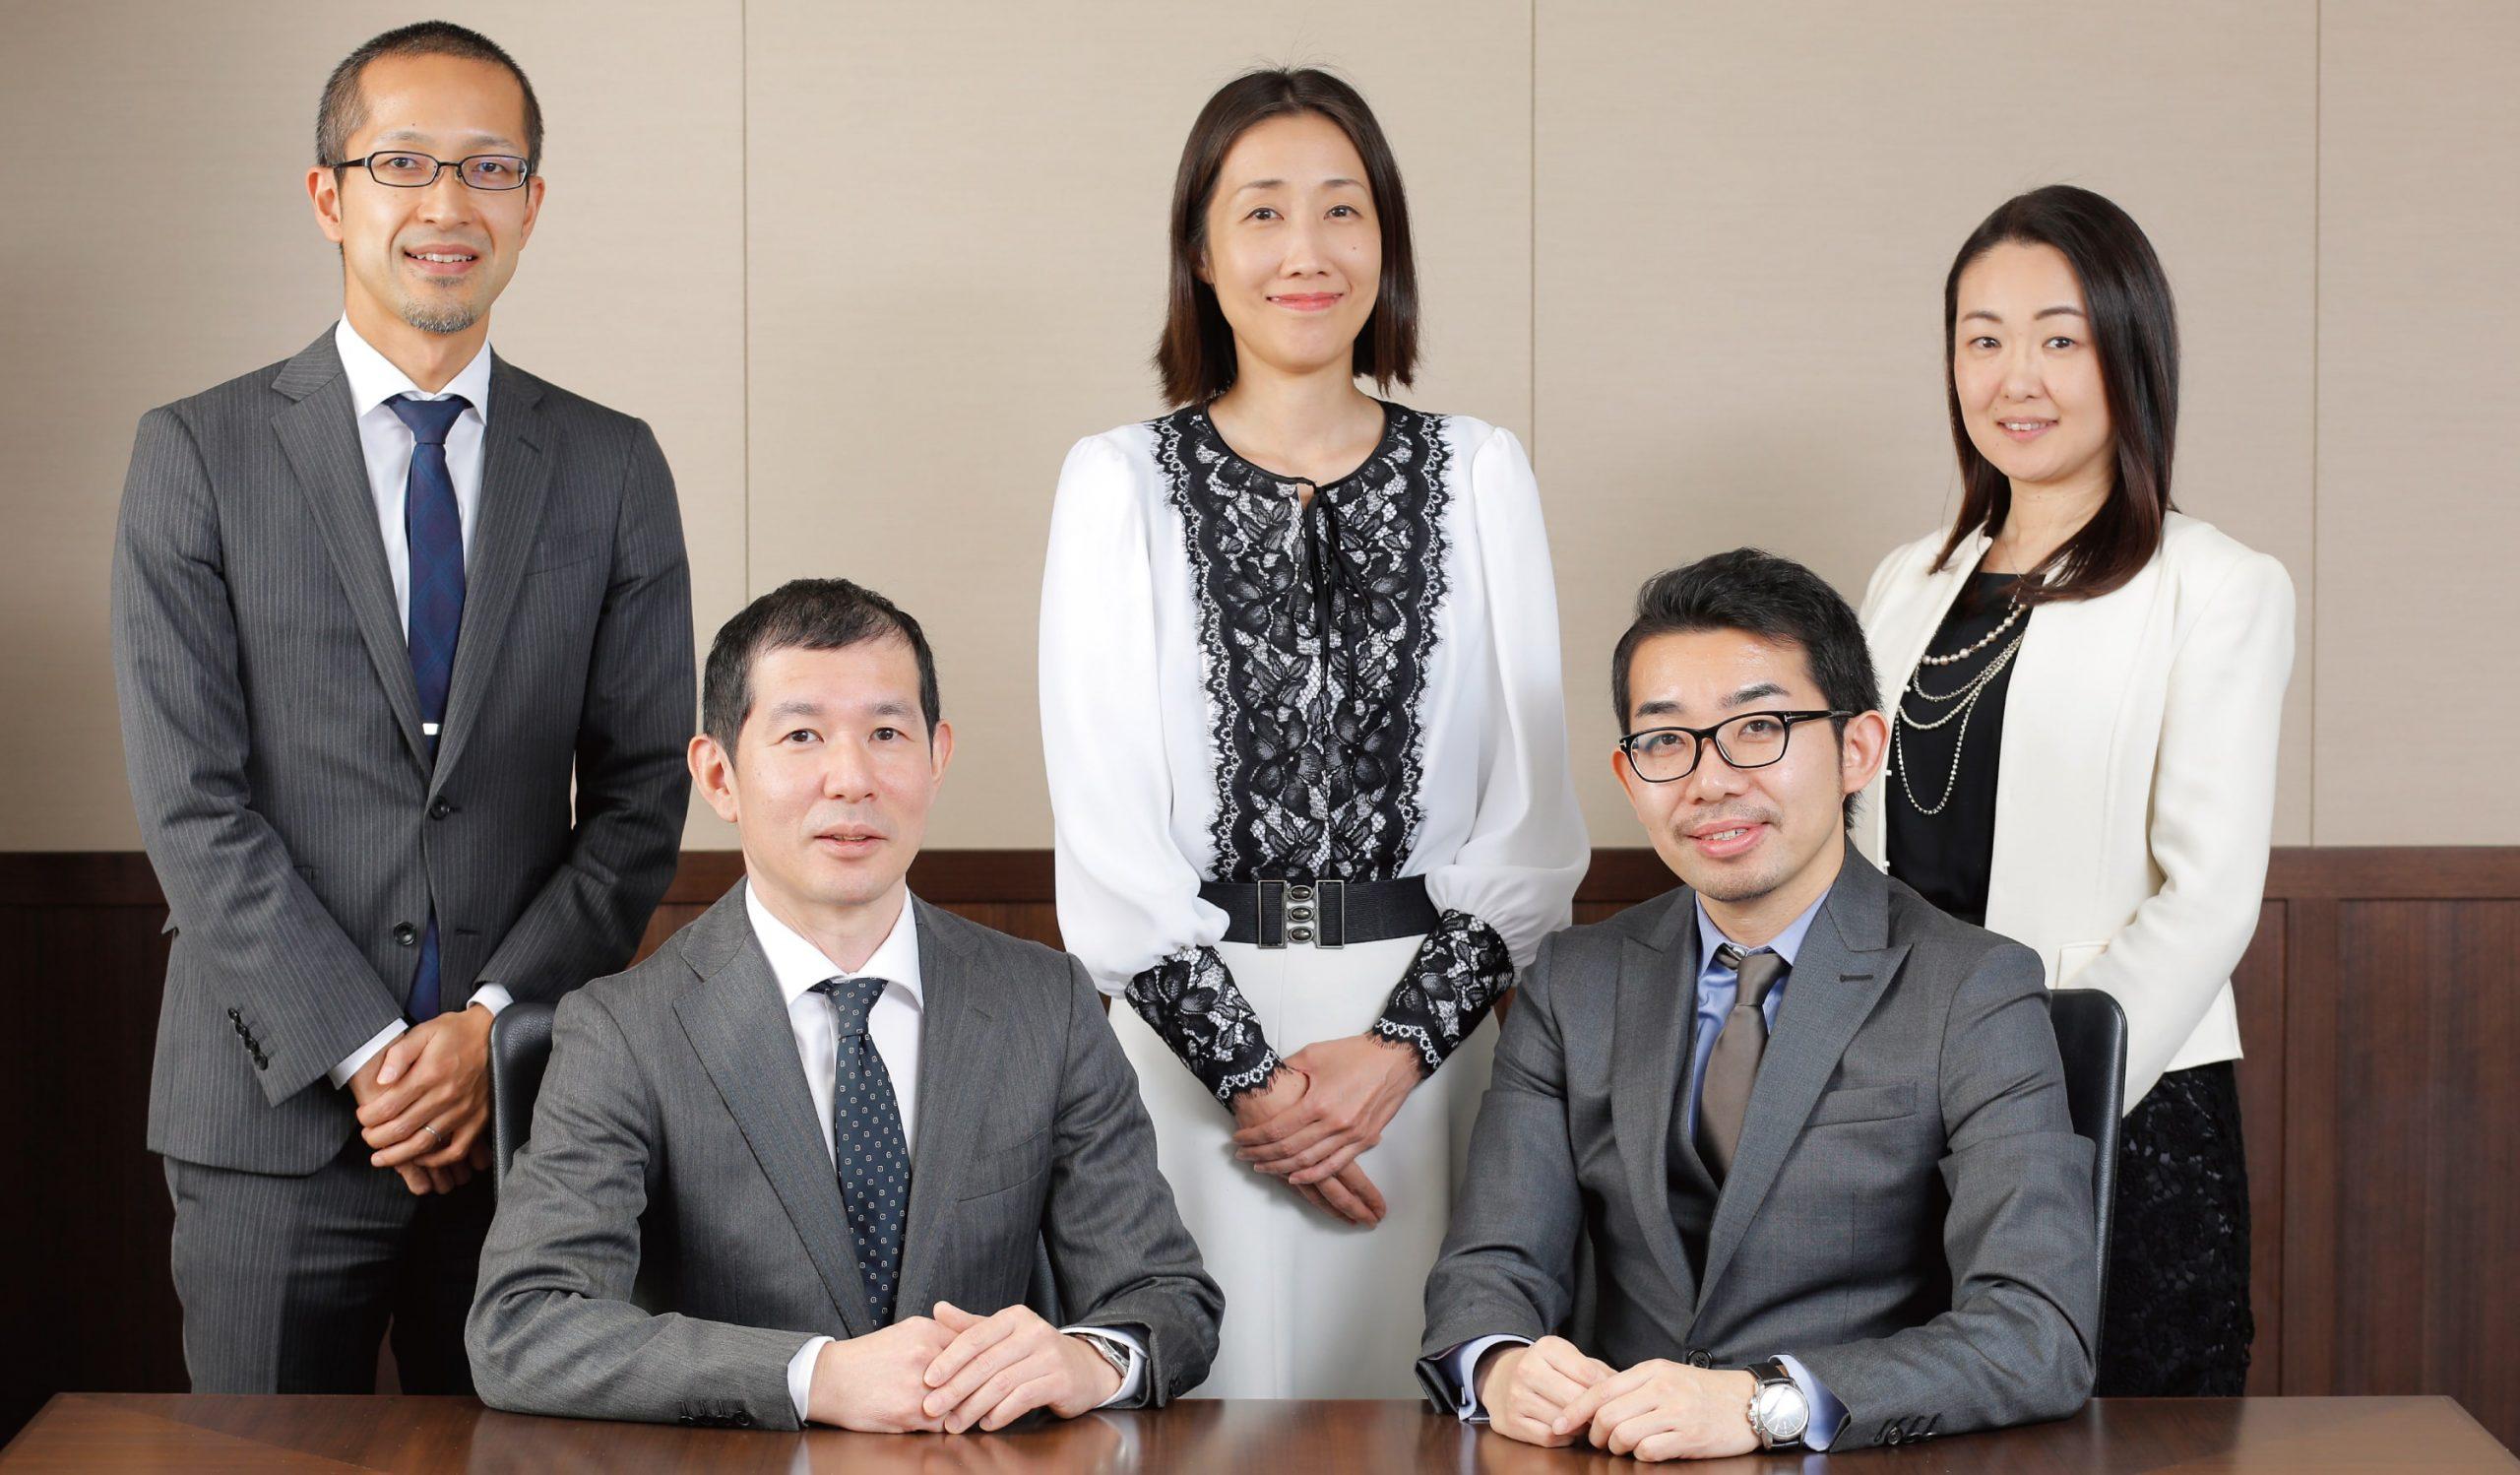 DT弁護士法人(デロイト トーマツ グループ)